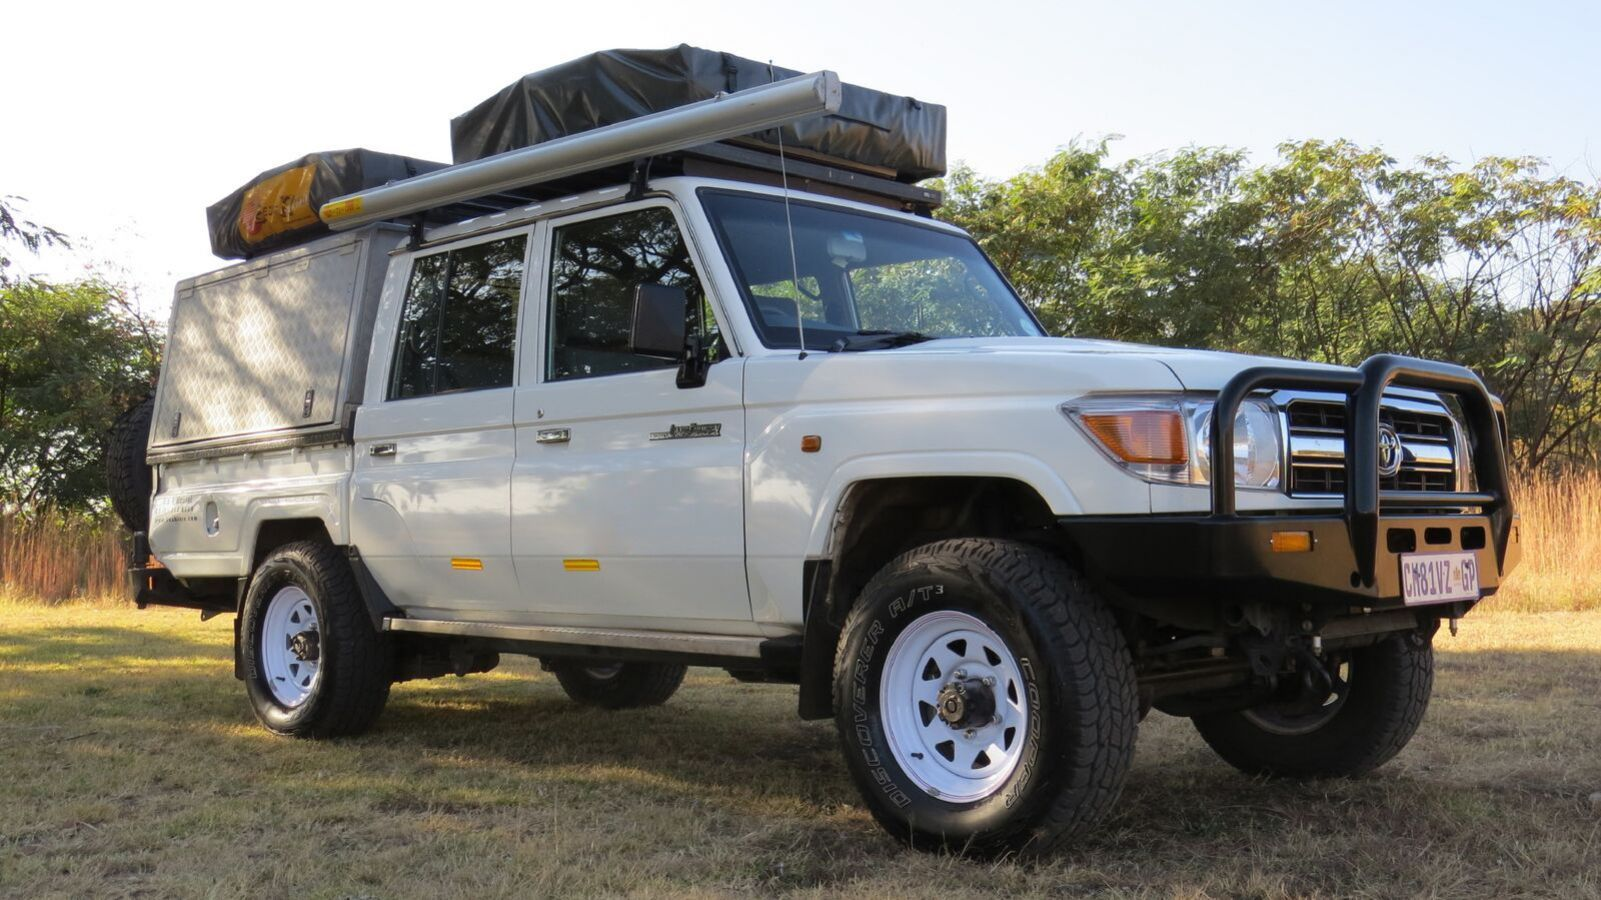 Toyota Landcruiser Double Cab daktenten ingeklapt